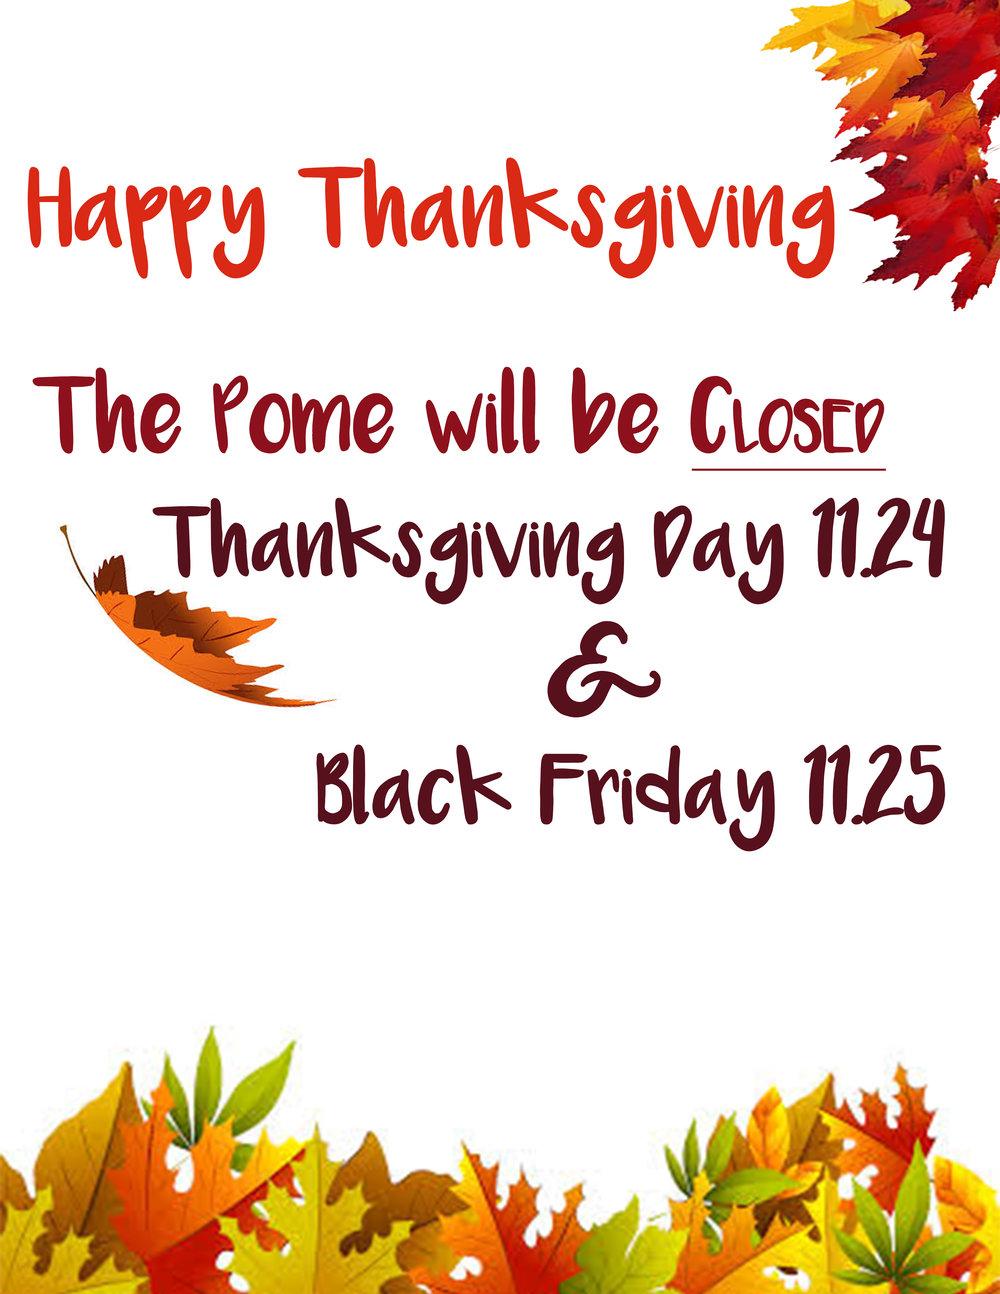 thanksgivingmessage.jpg